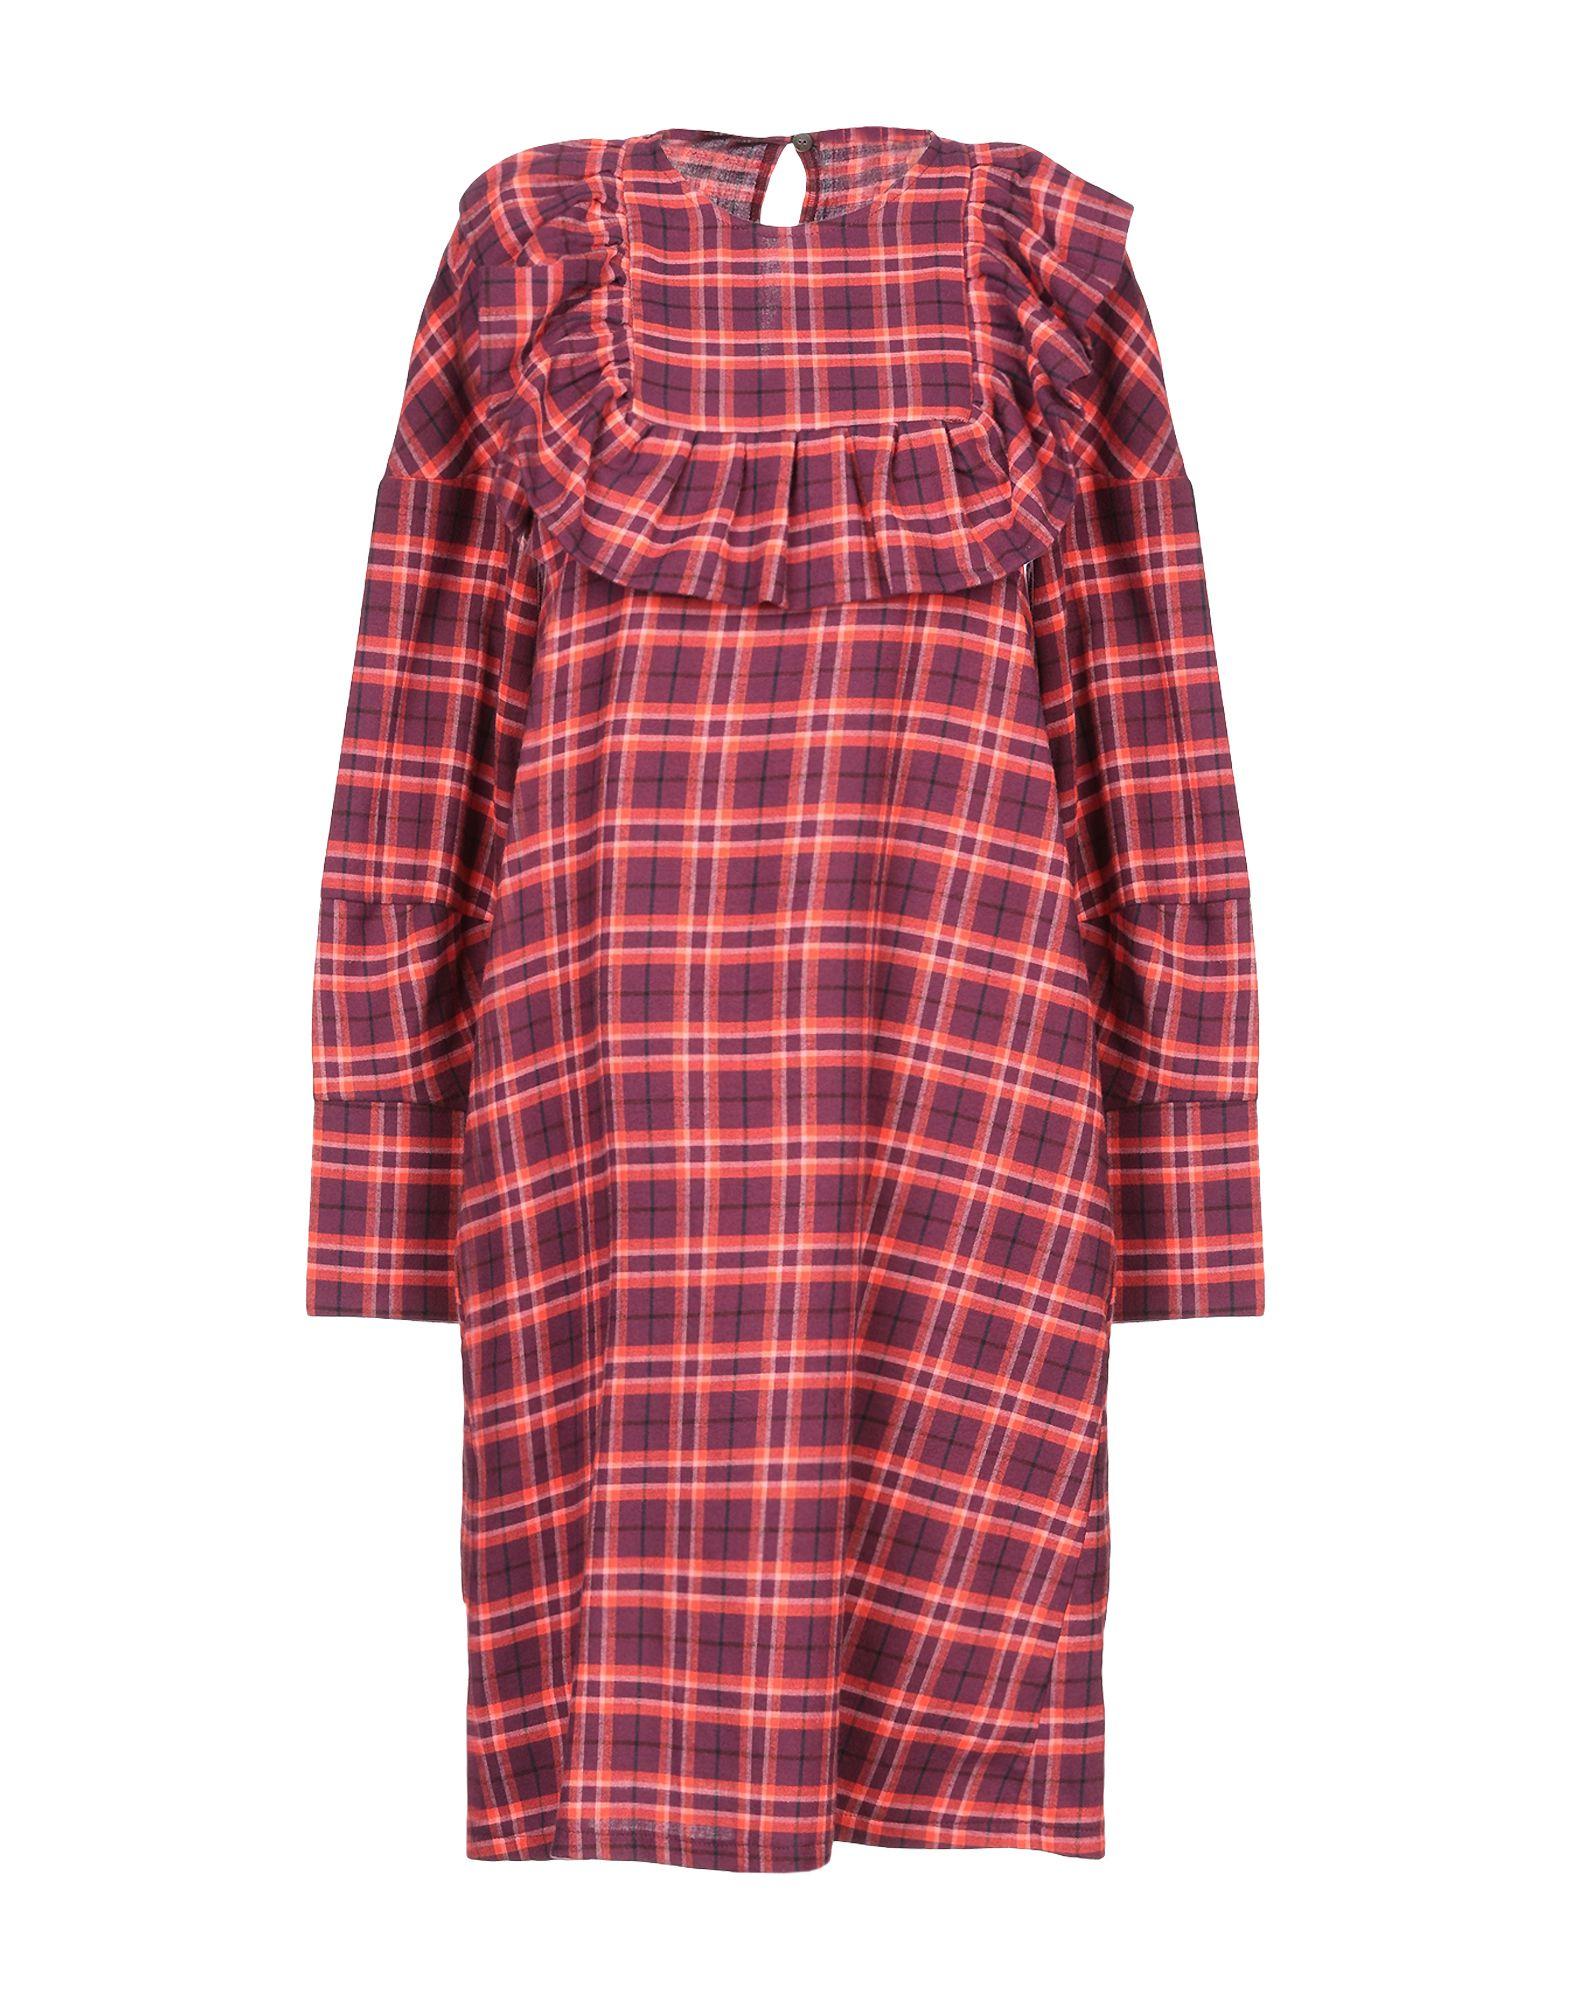 ROSE' A POIS Платье до колена